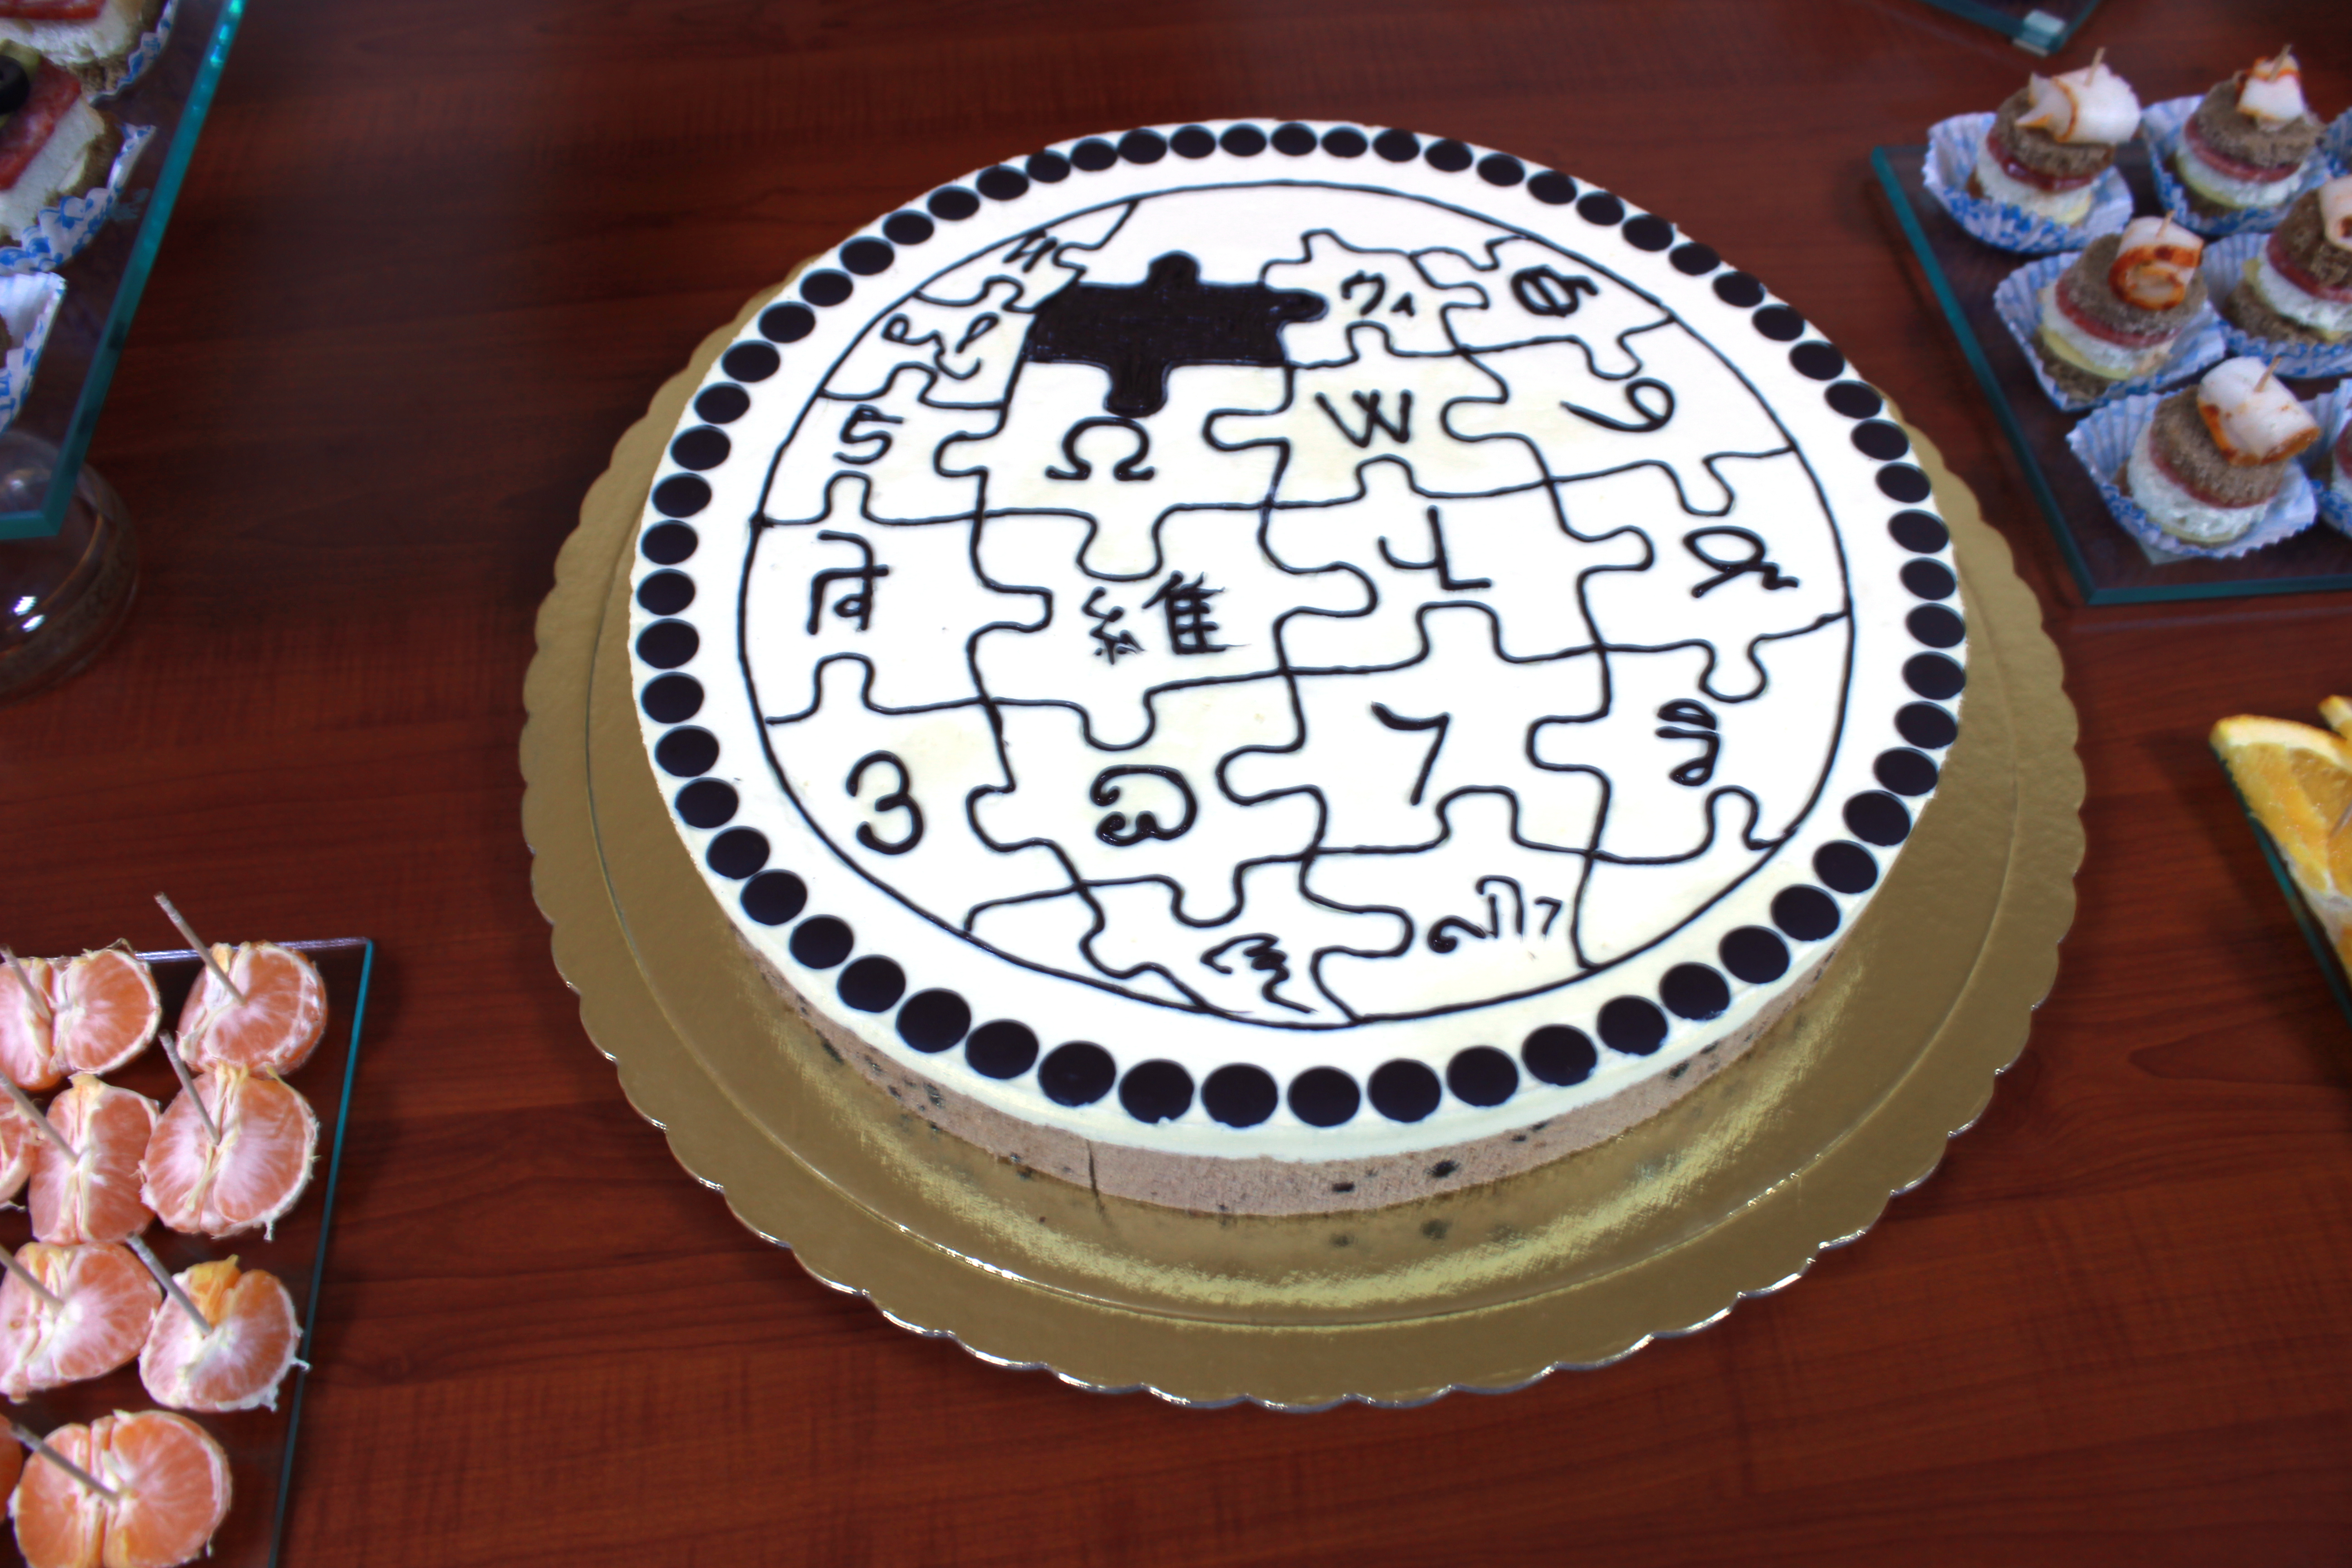 Electrical Engineer Birthday Cake